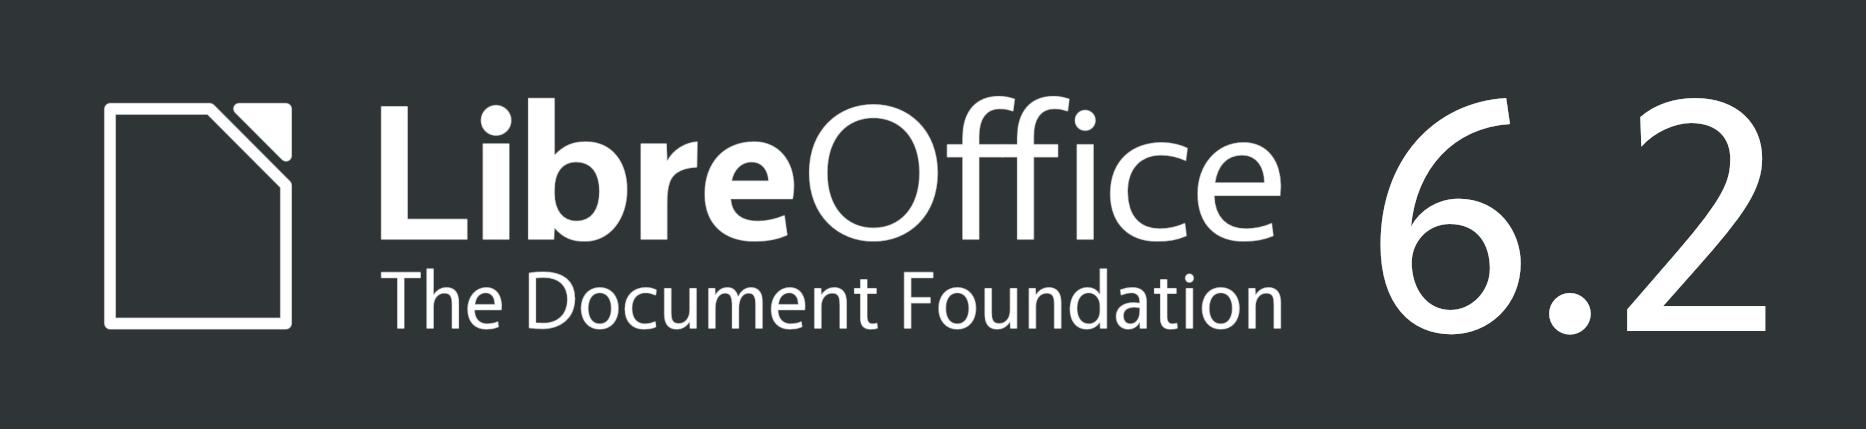 LibreOffice 6.2 logó